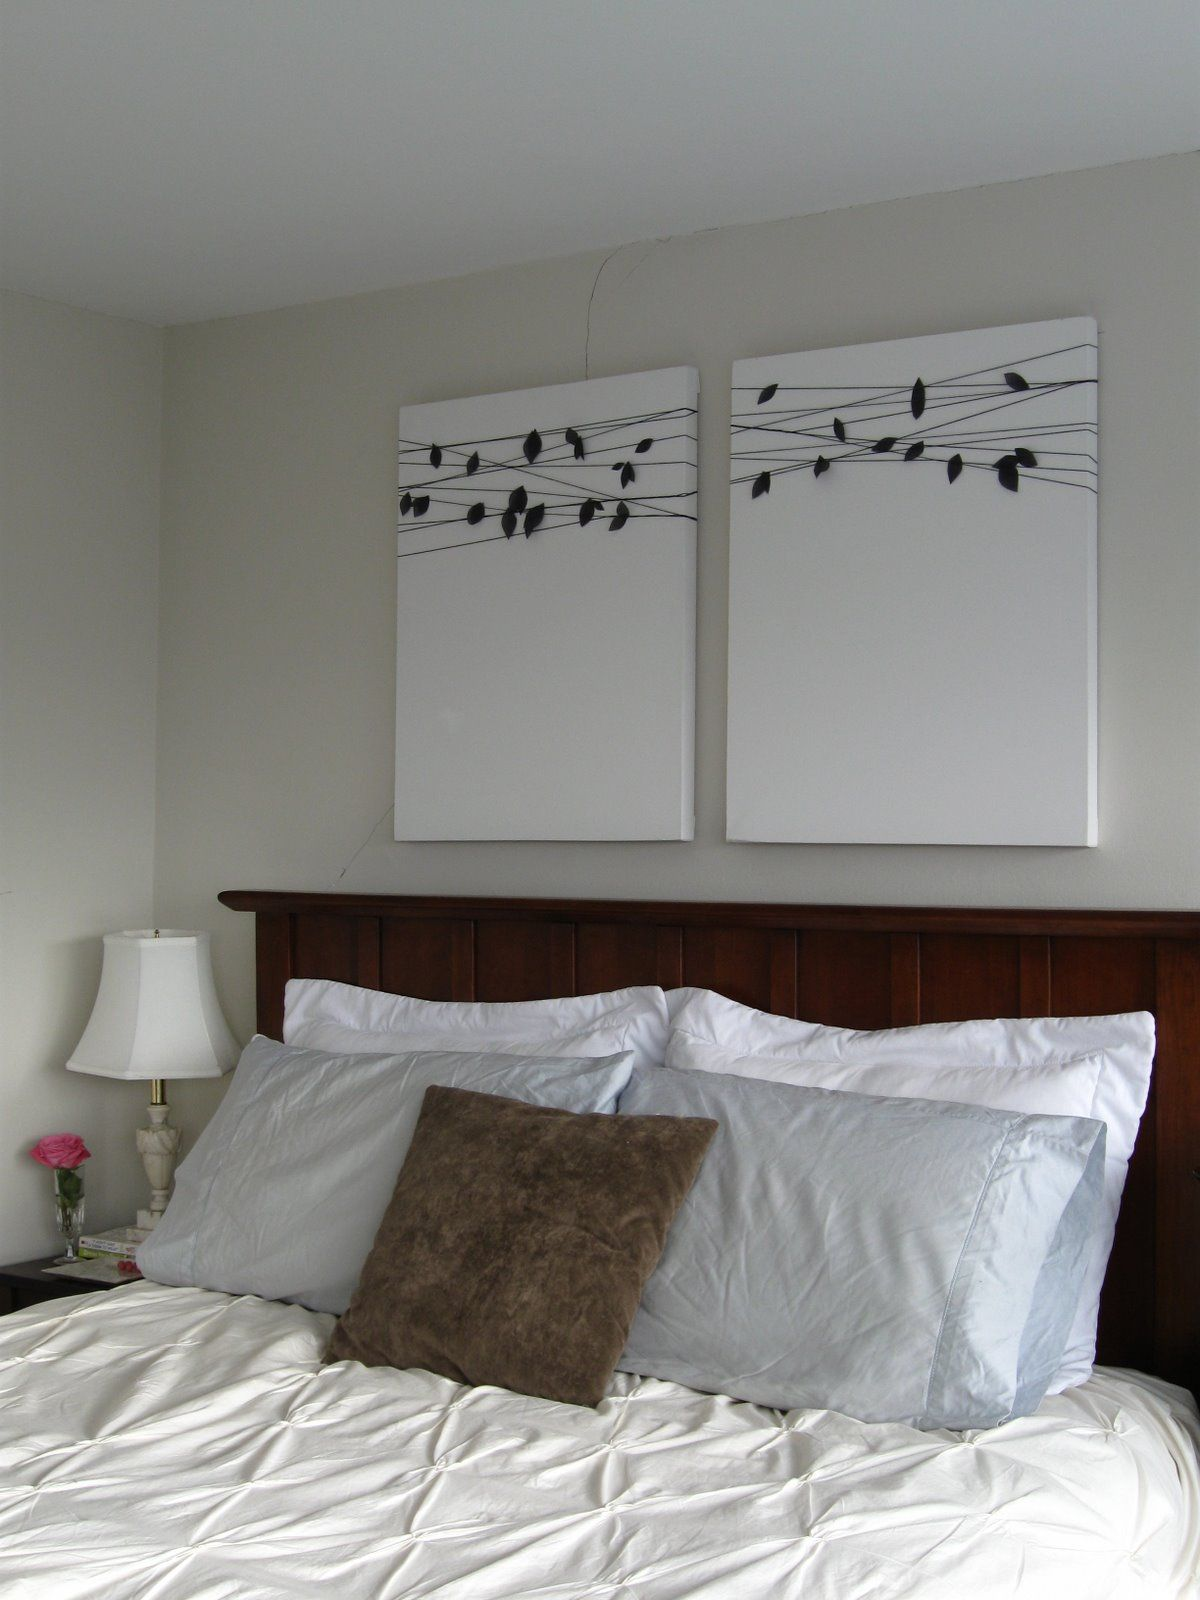 No Paint Artwork In 15 Minutes Wall Decor Bedroom Wall Art Diy